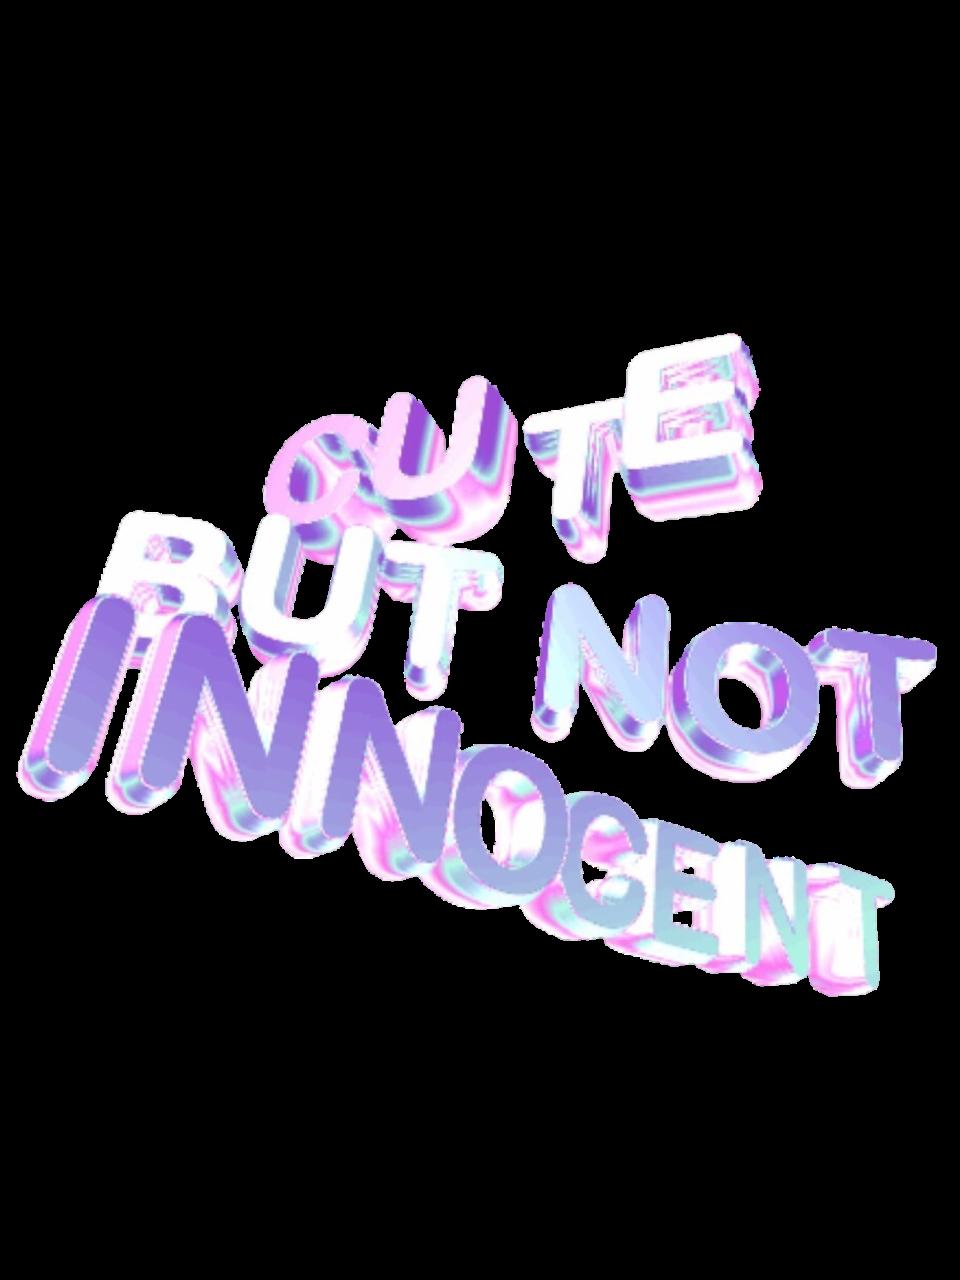 overlay edit 3d words text cute aesthetic purple tumblr